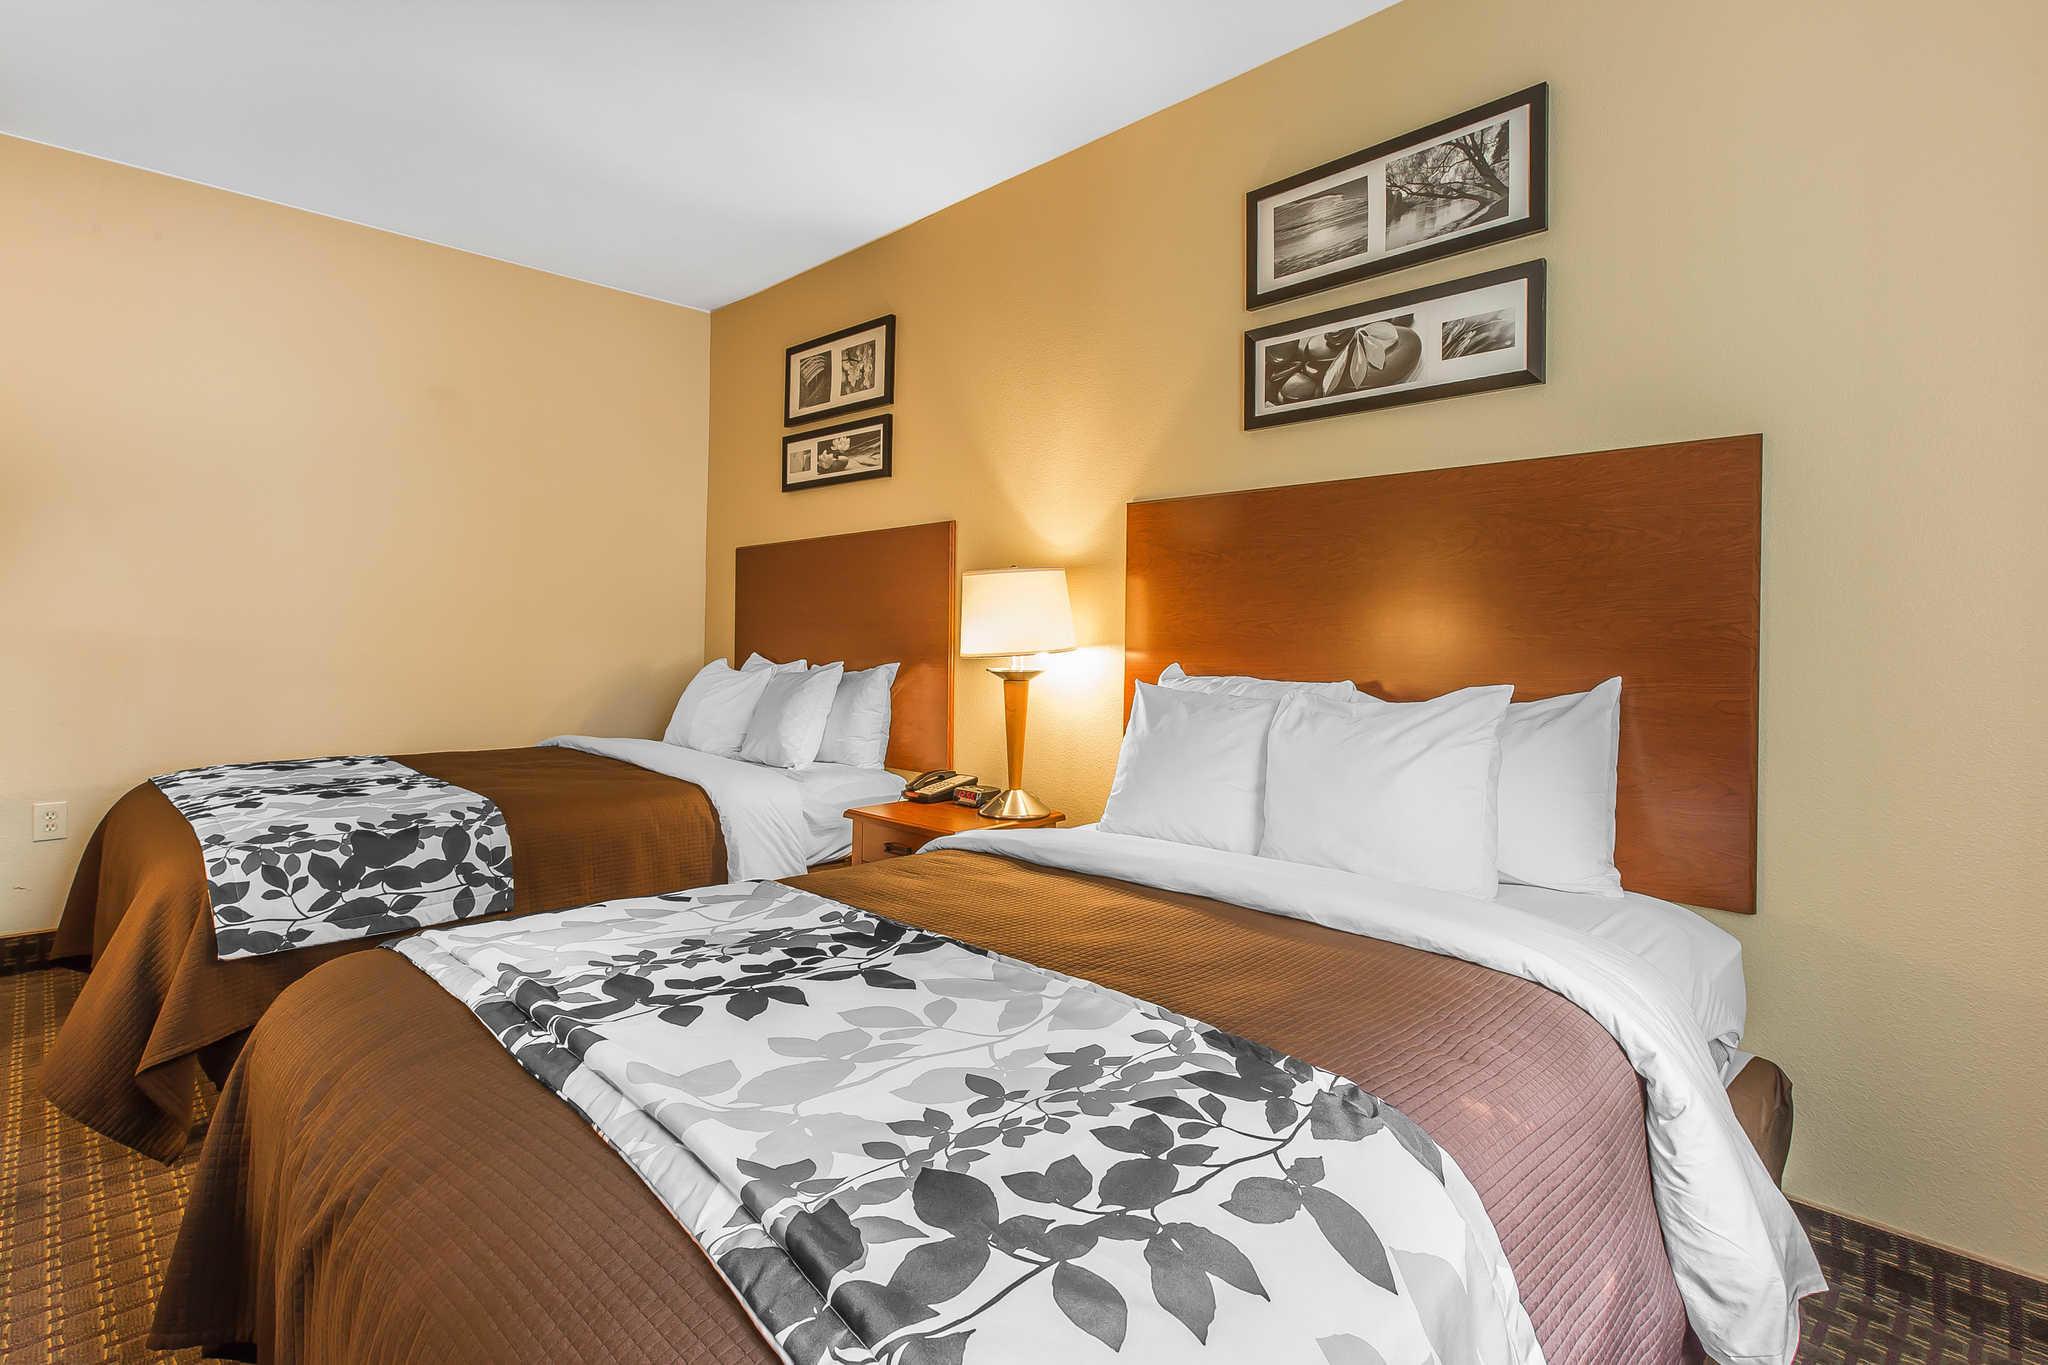 Sleep Inn & Suites At Kennesaw State University image 20